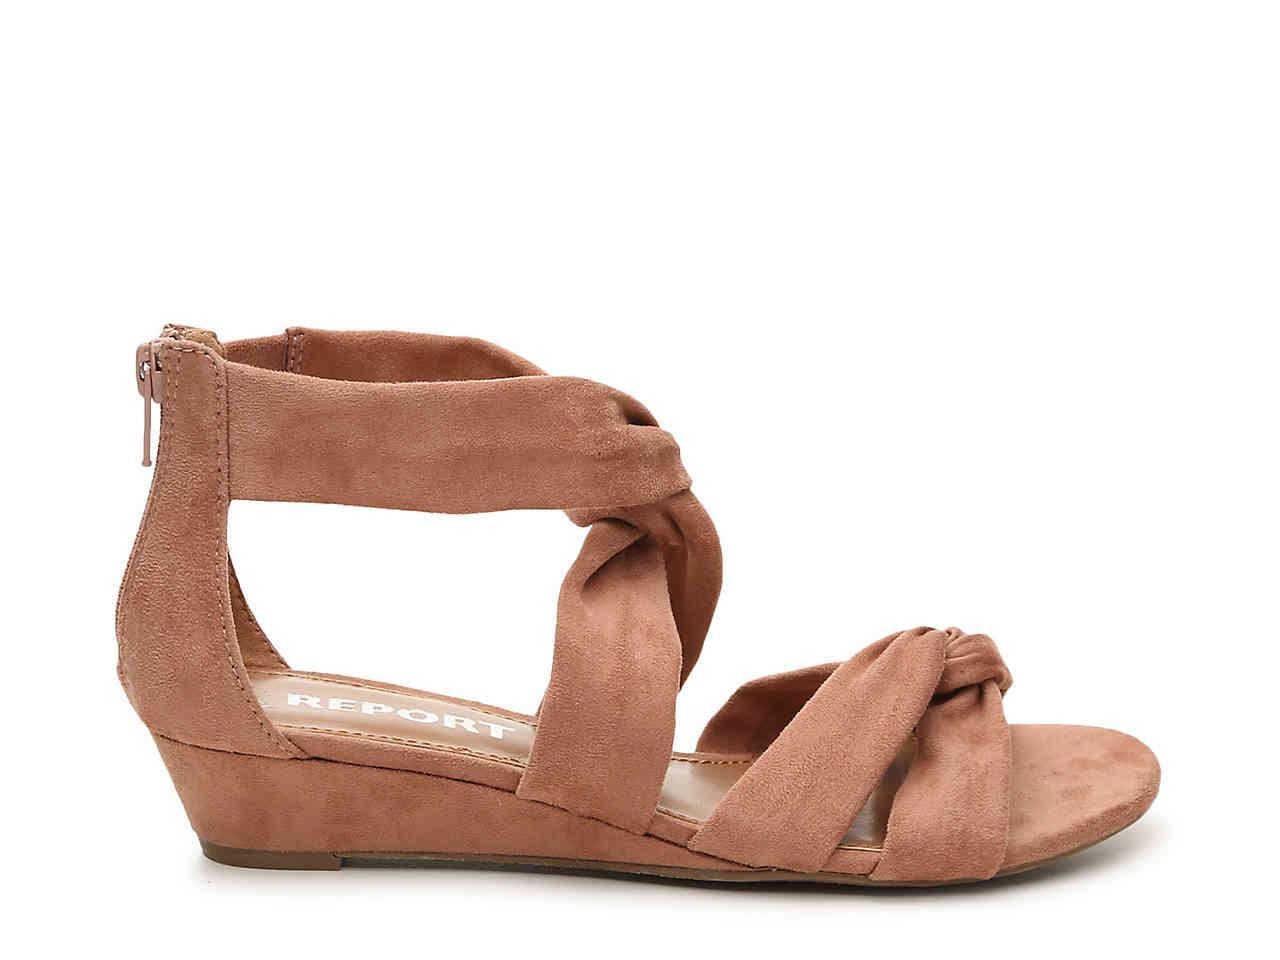 Jenny Wedge Sandal in Mauve (Purple) - Lyst